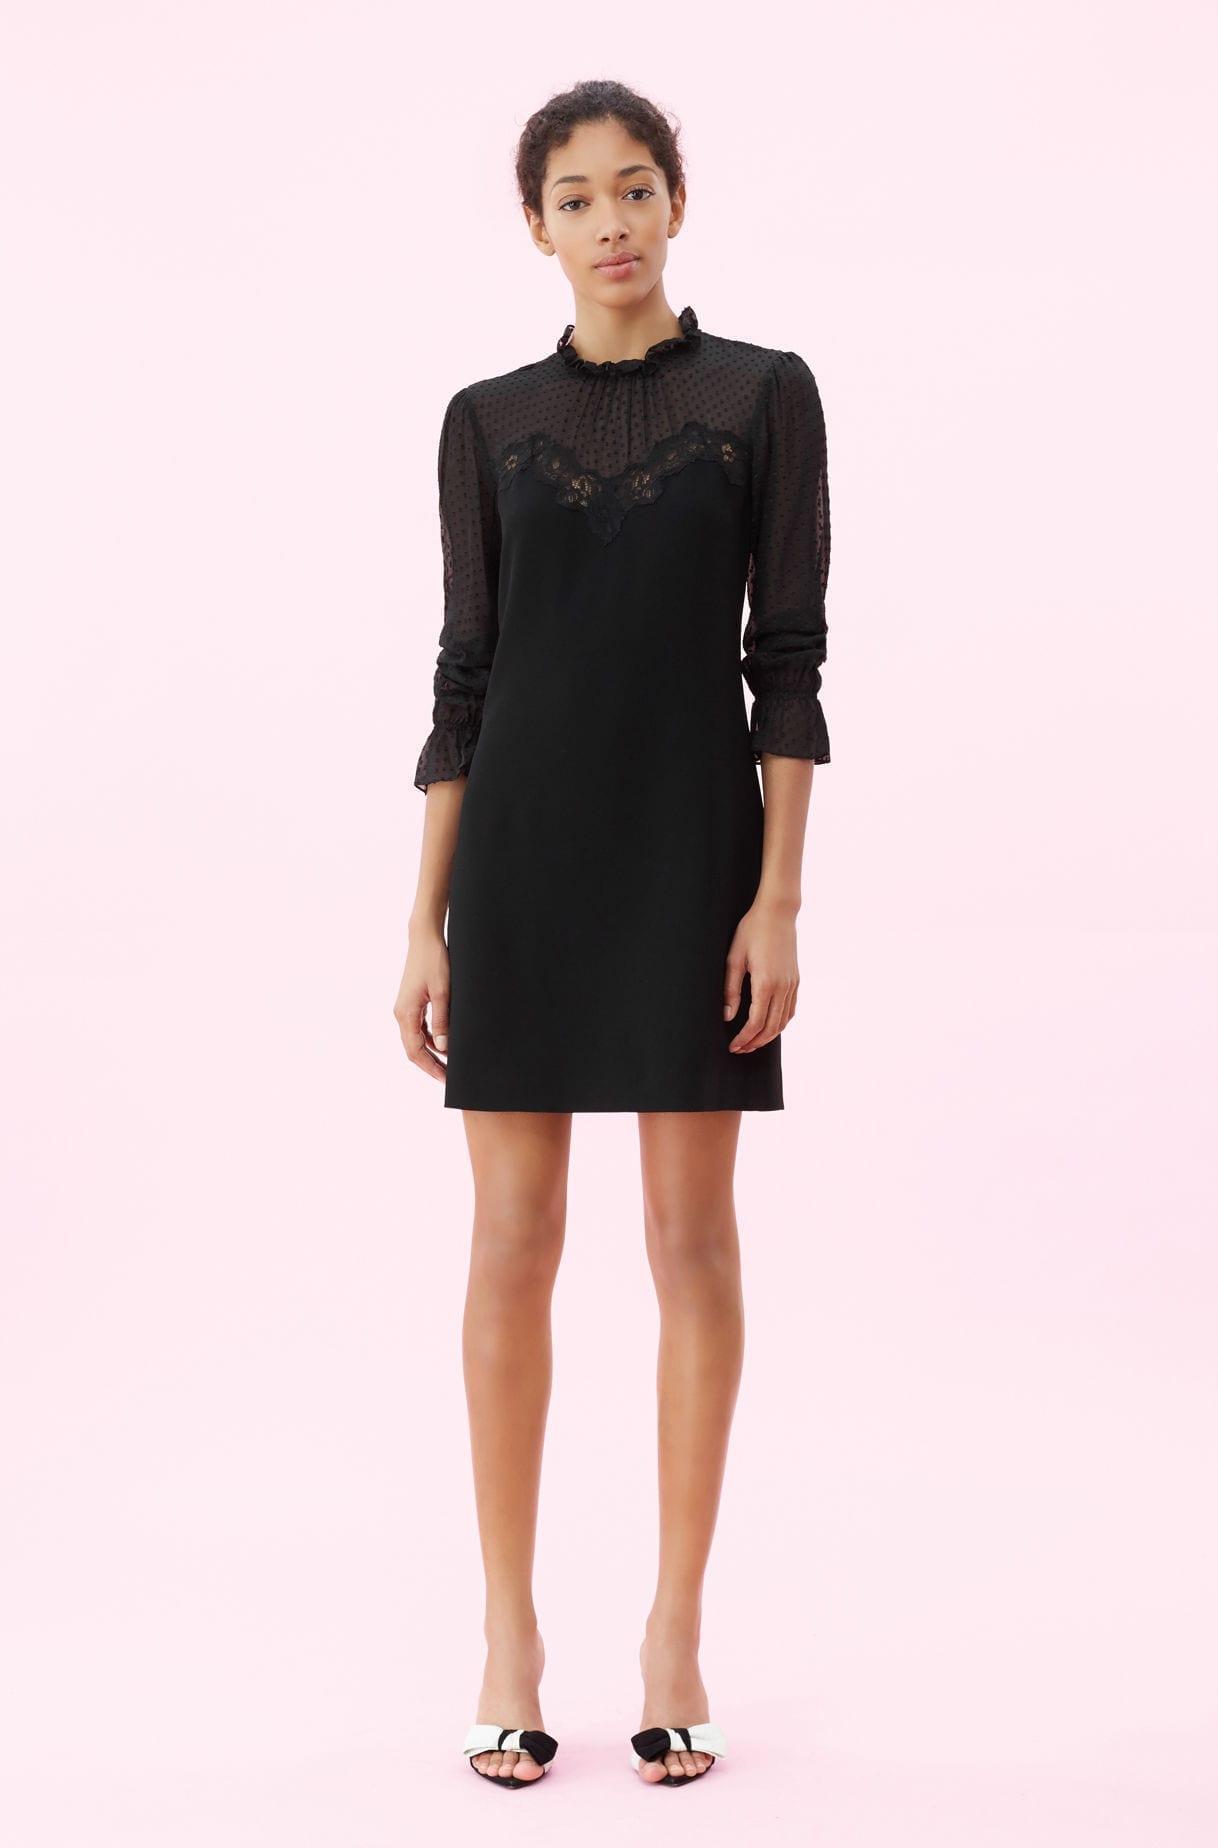 c642a7a8 REBECCA TAYLOR Crepe & Lace Black Dress - We Select Dresses